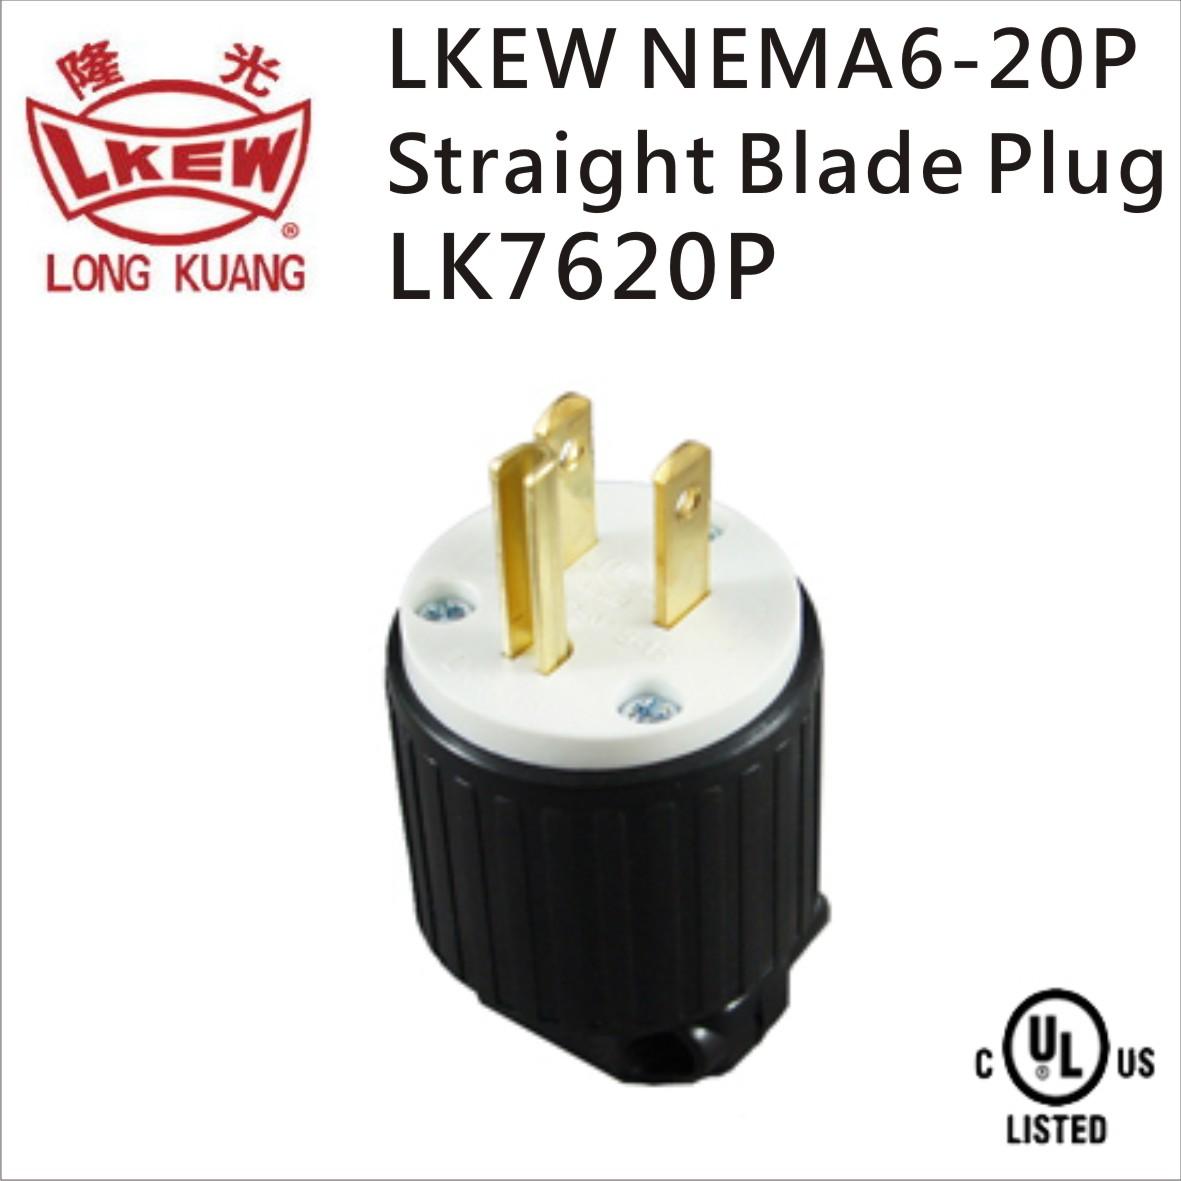 hight resolution of taiwan lkew nema straight blade plug wiring lk7620p 6 20p enproteko co ltd